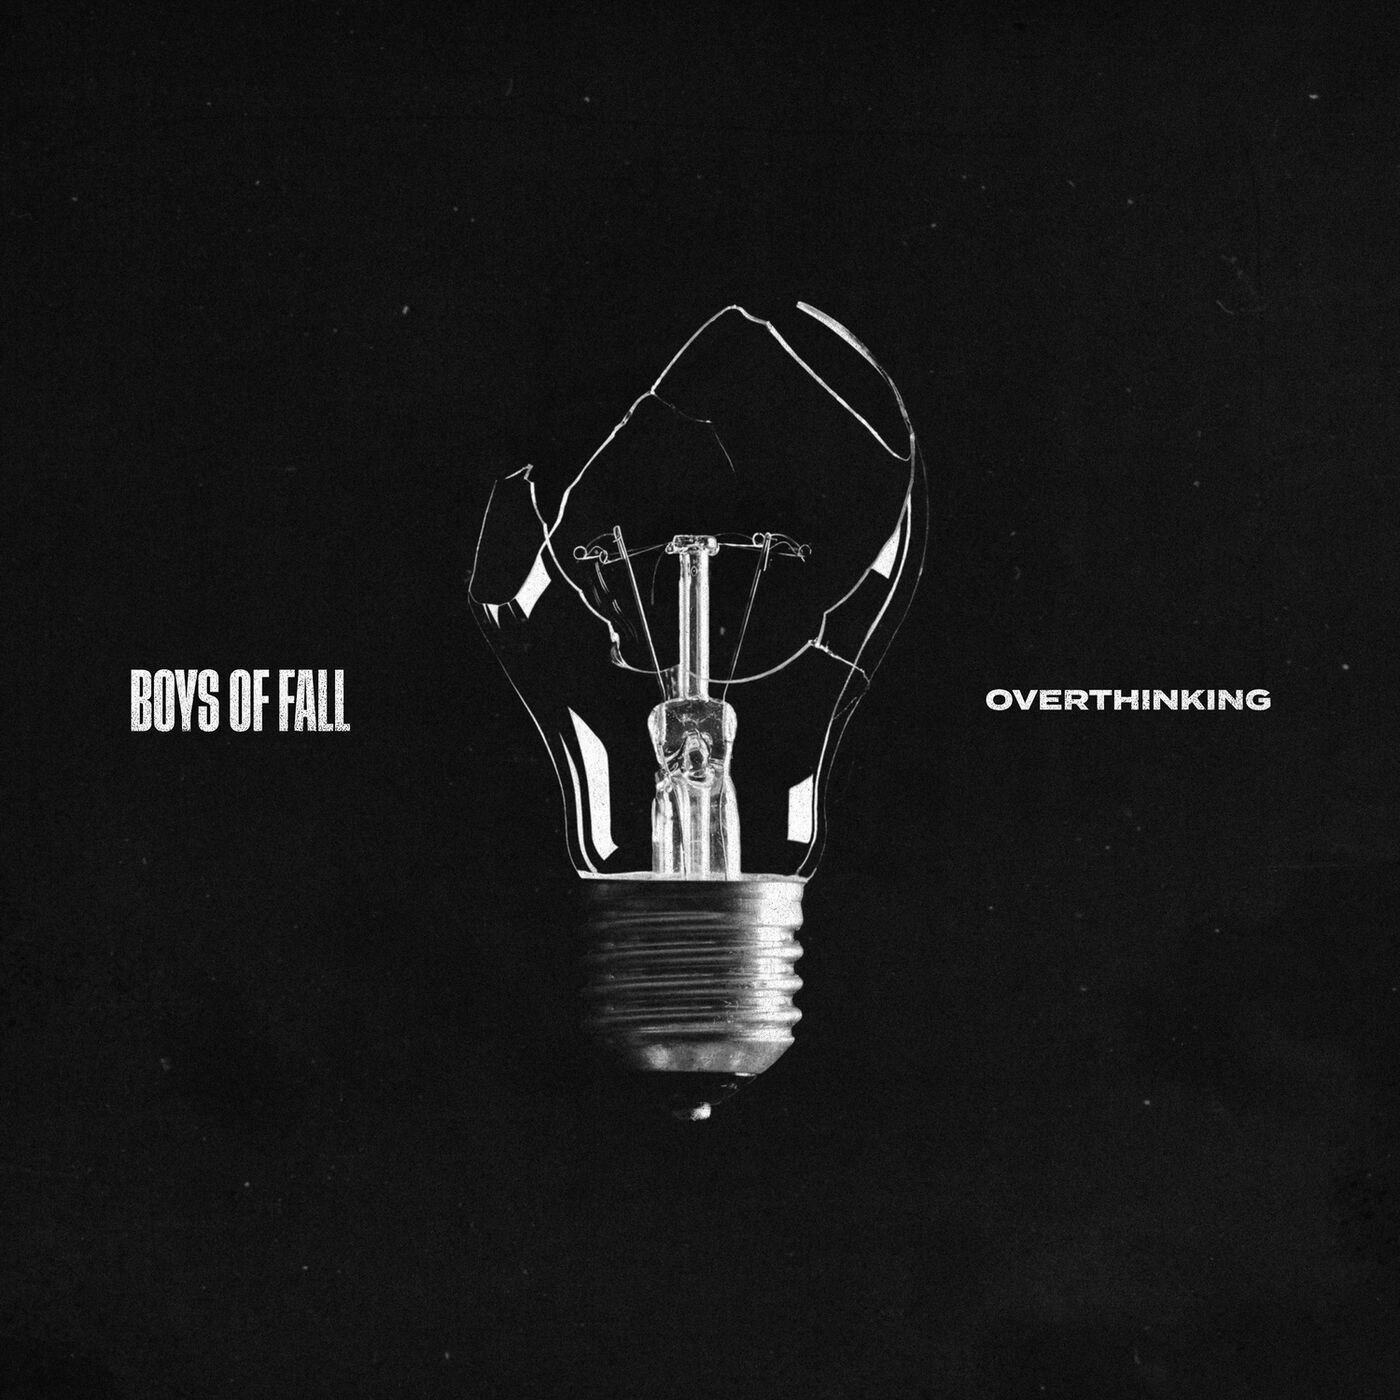 Boys of Fall - Overthinking [single] (2020)